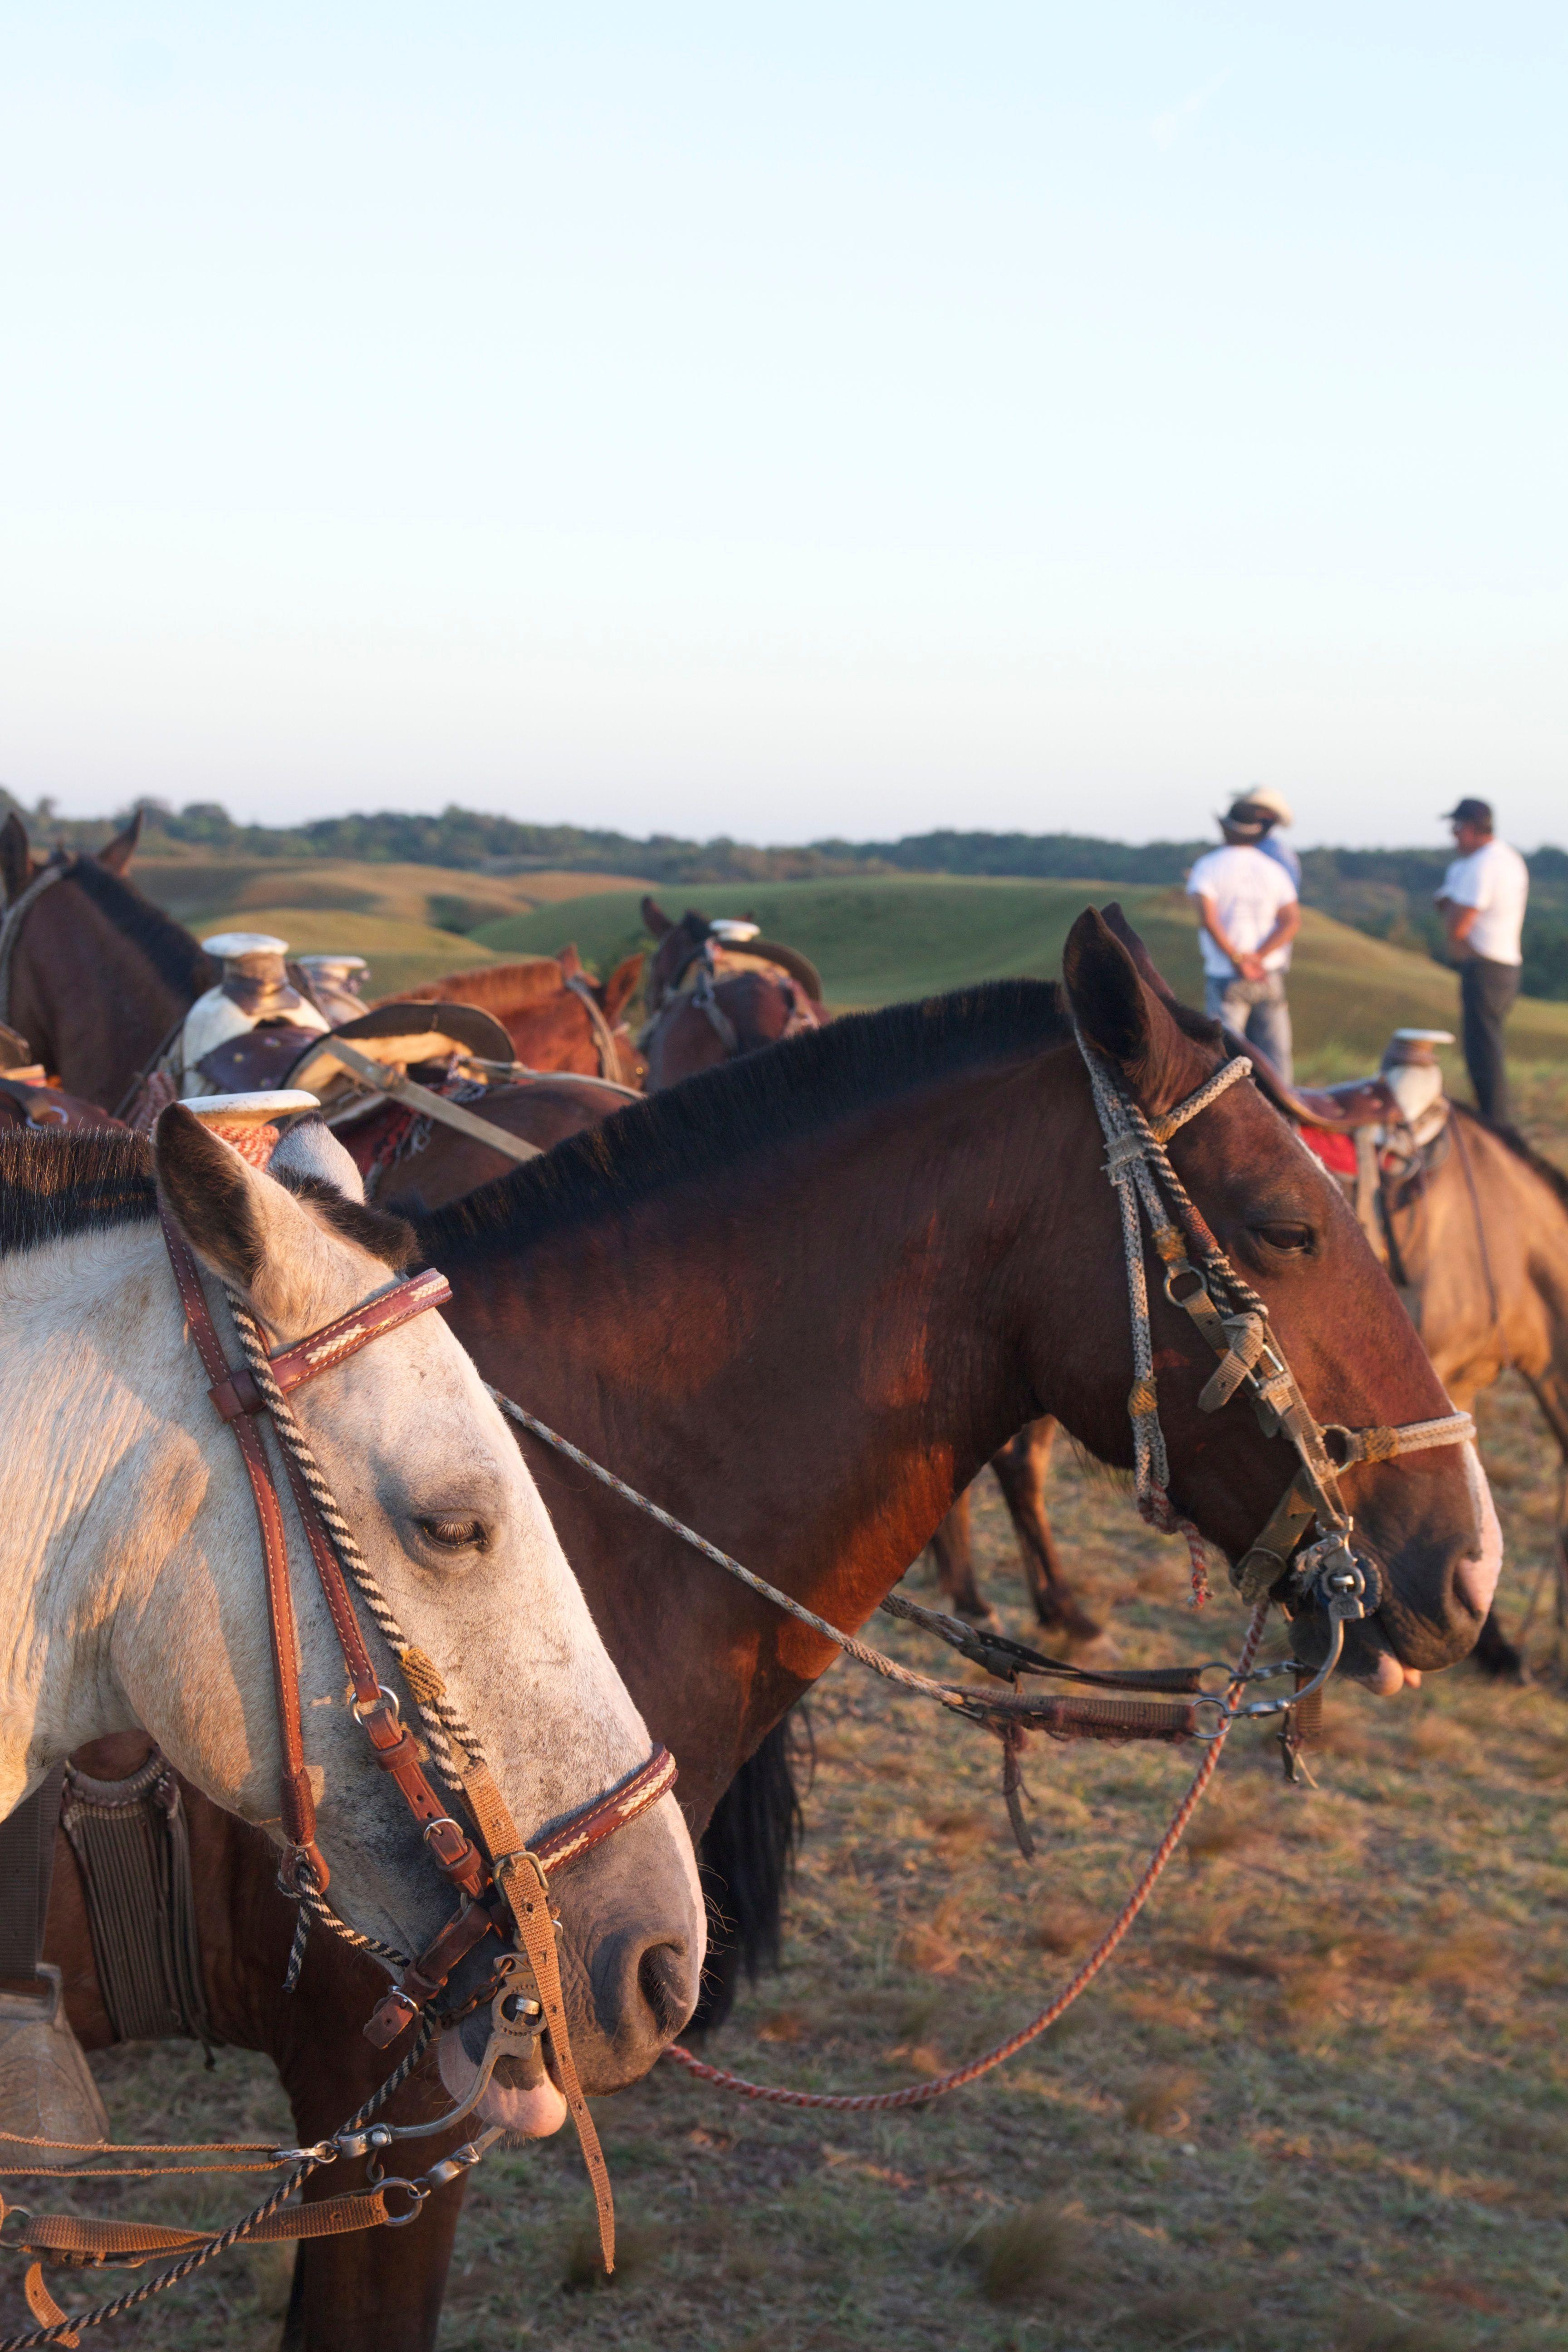 Horseback_LanosDeMenegua_IMG_3665.jpg